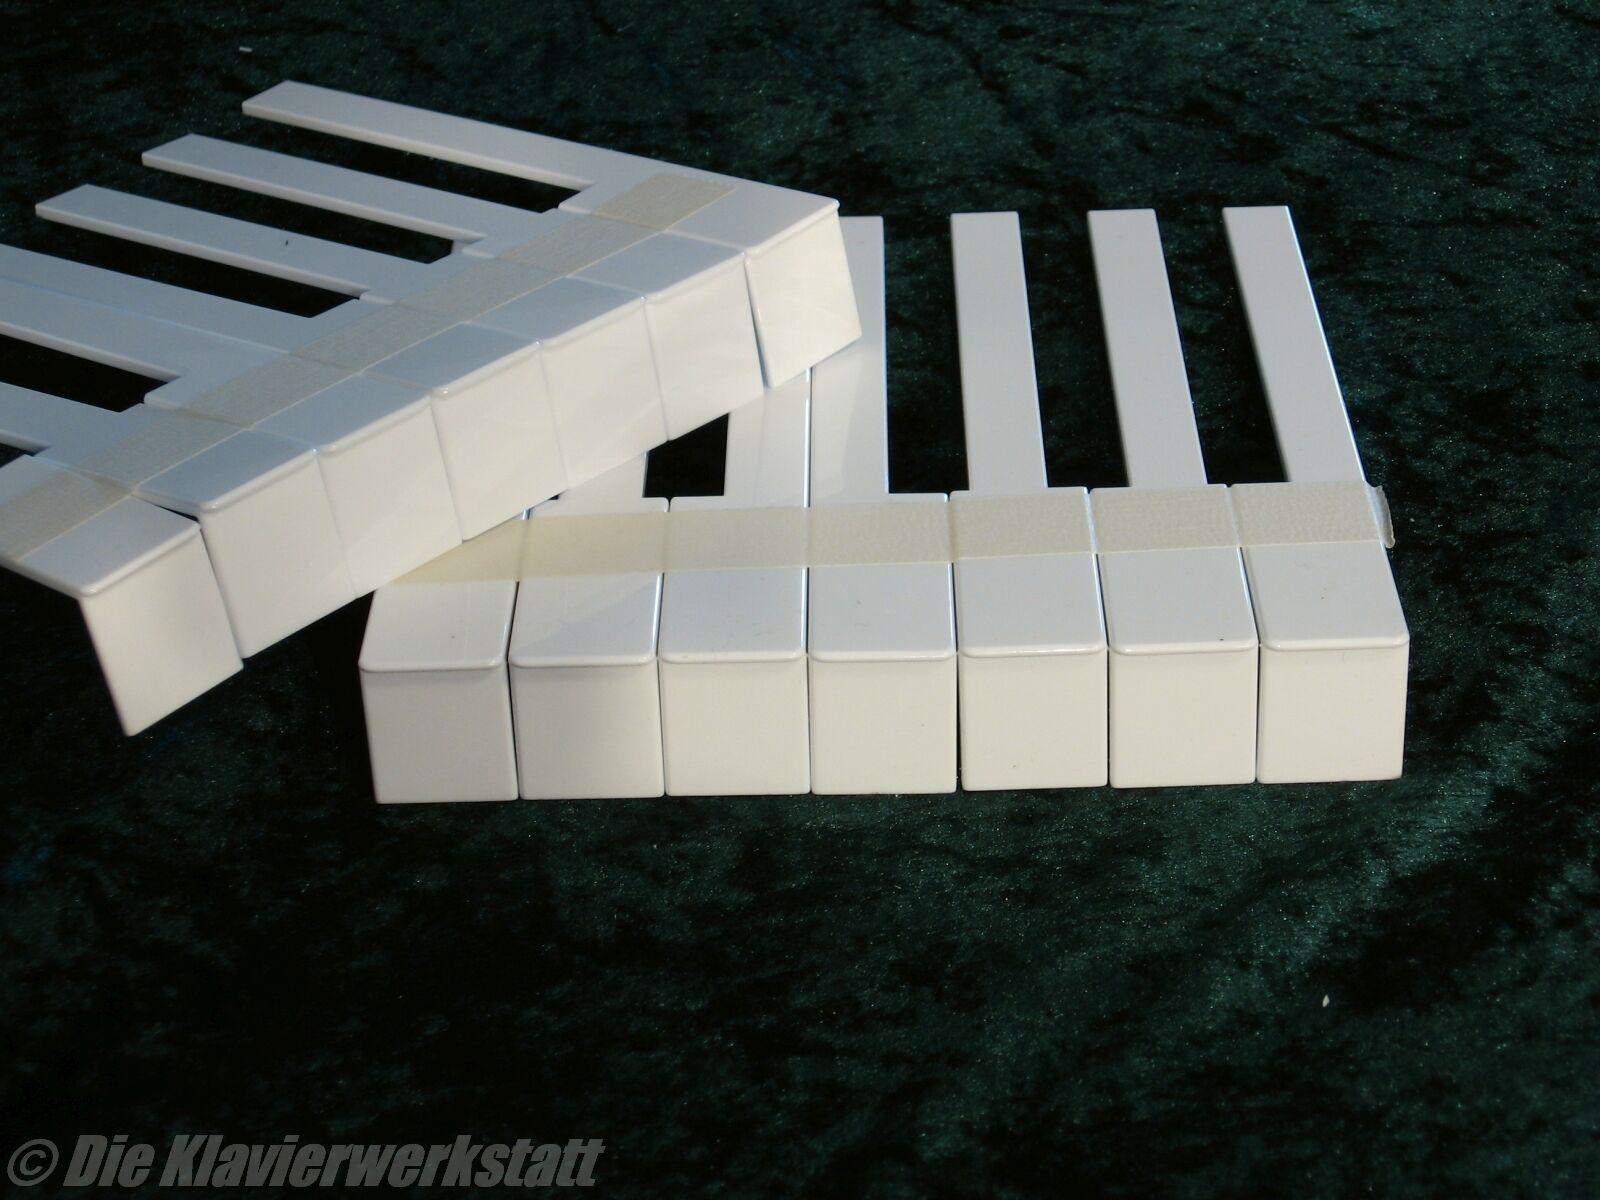 Klavier Flügel Beläge Tasten Kunststoff Kunststoff Kunststoff  Klaviaturbeläge Fronten neu 8f4c3b